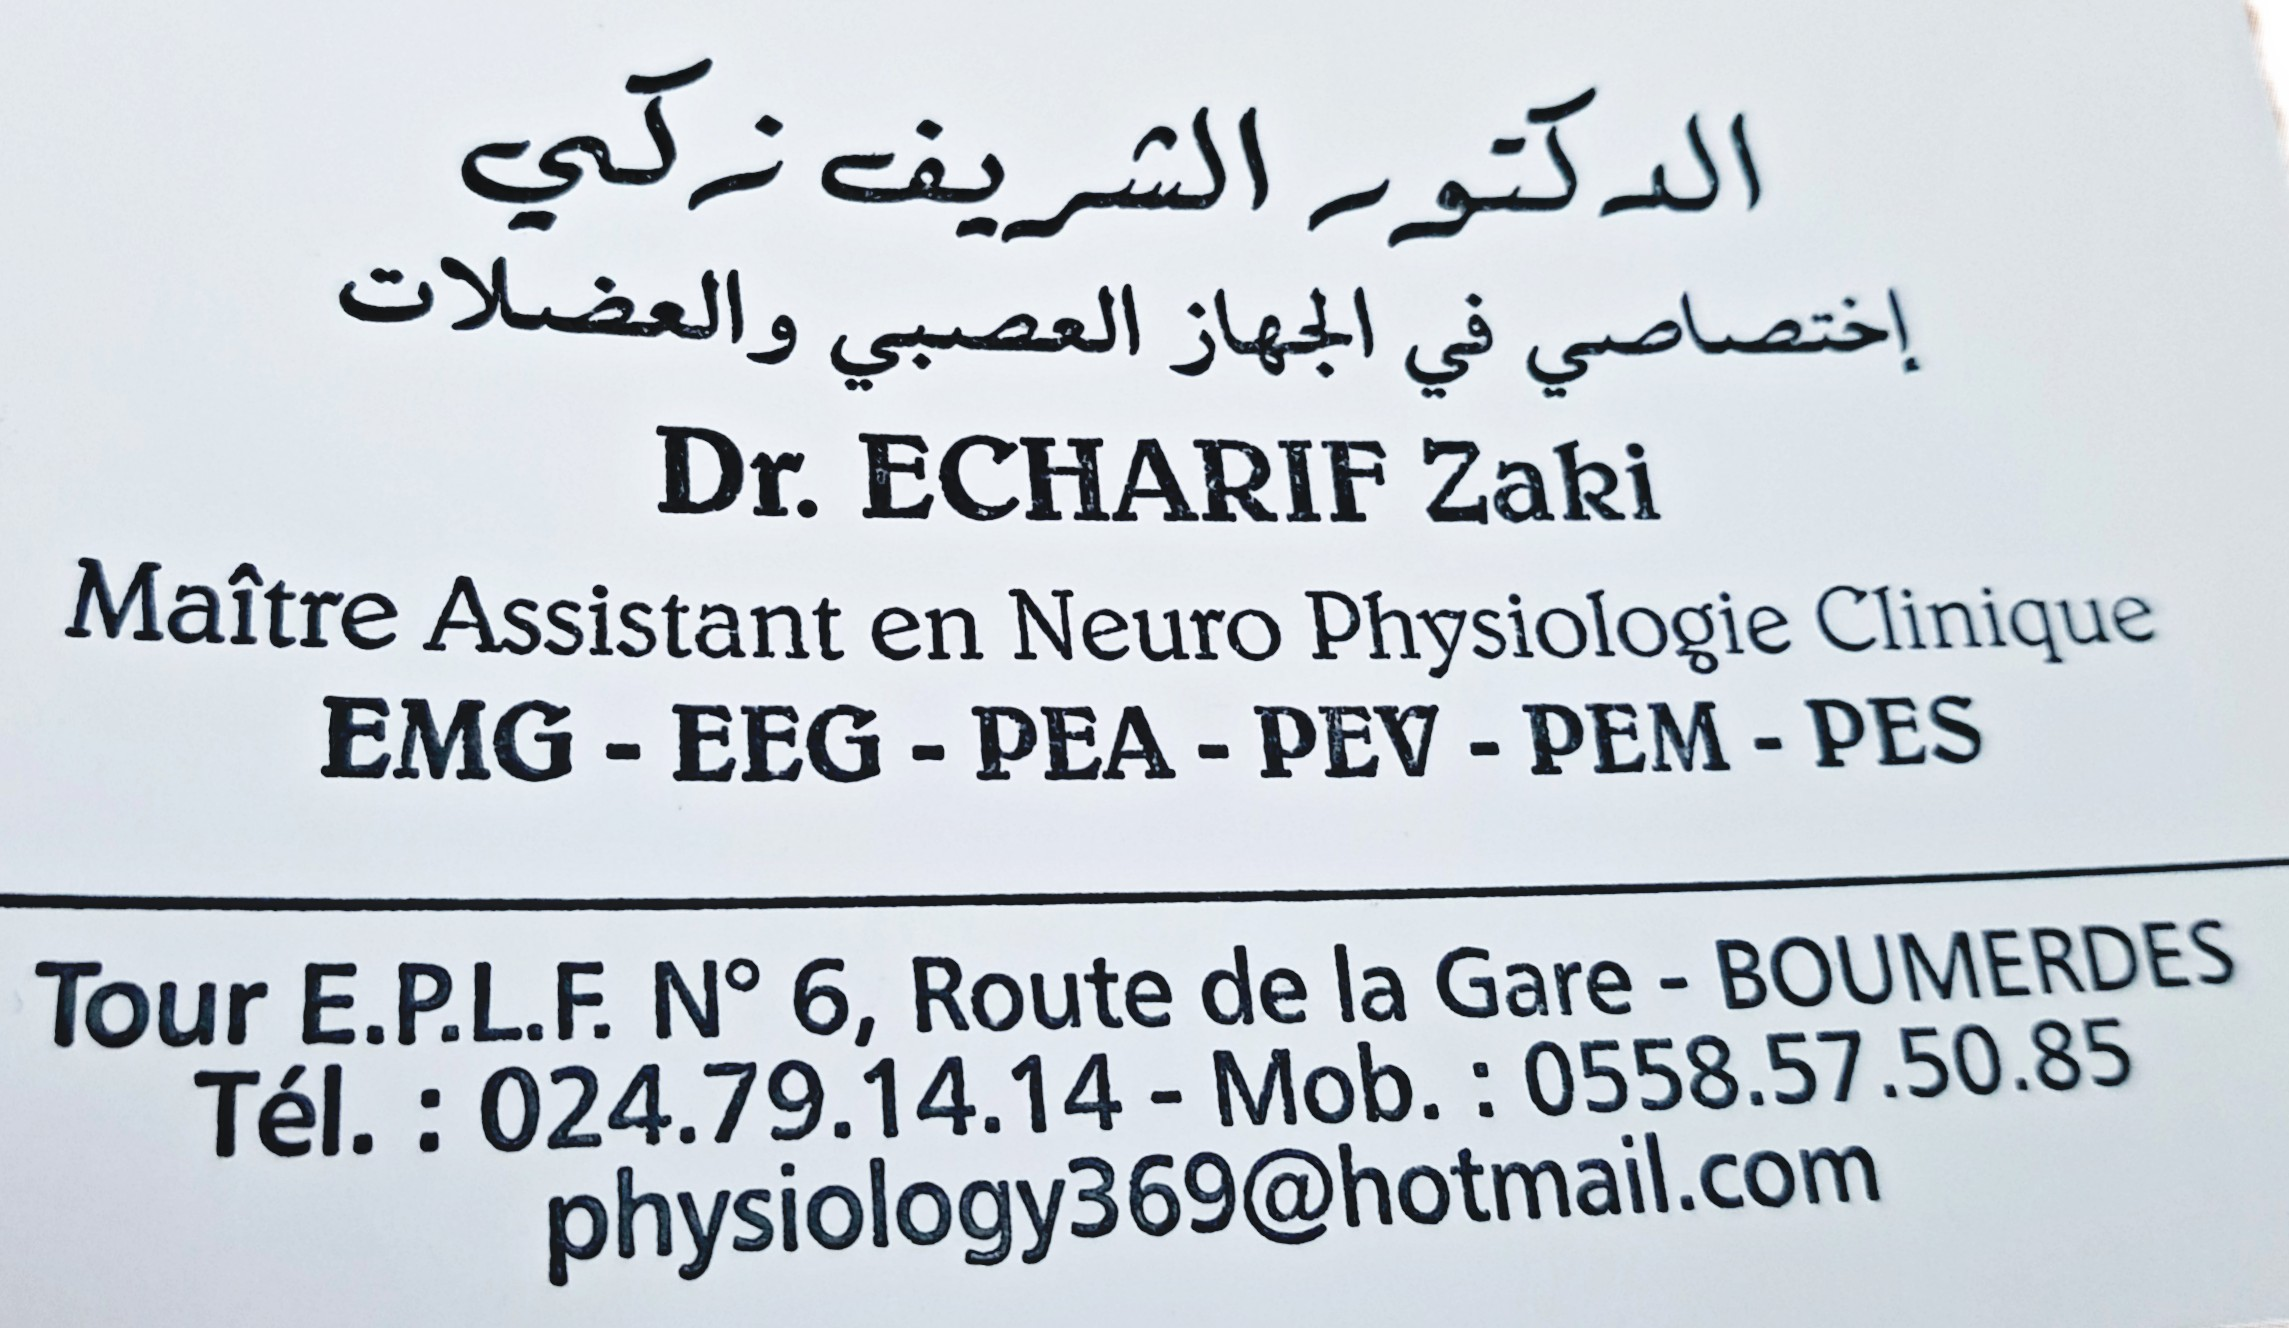 medecin specialiste en neurophysiologie clinique